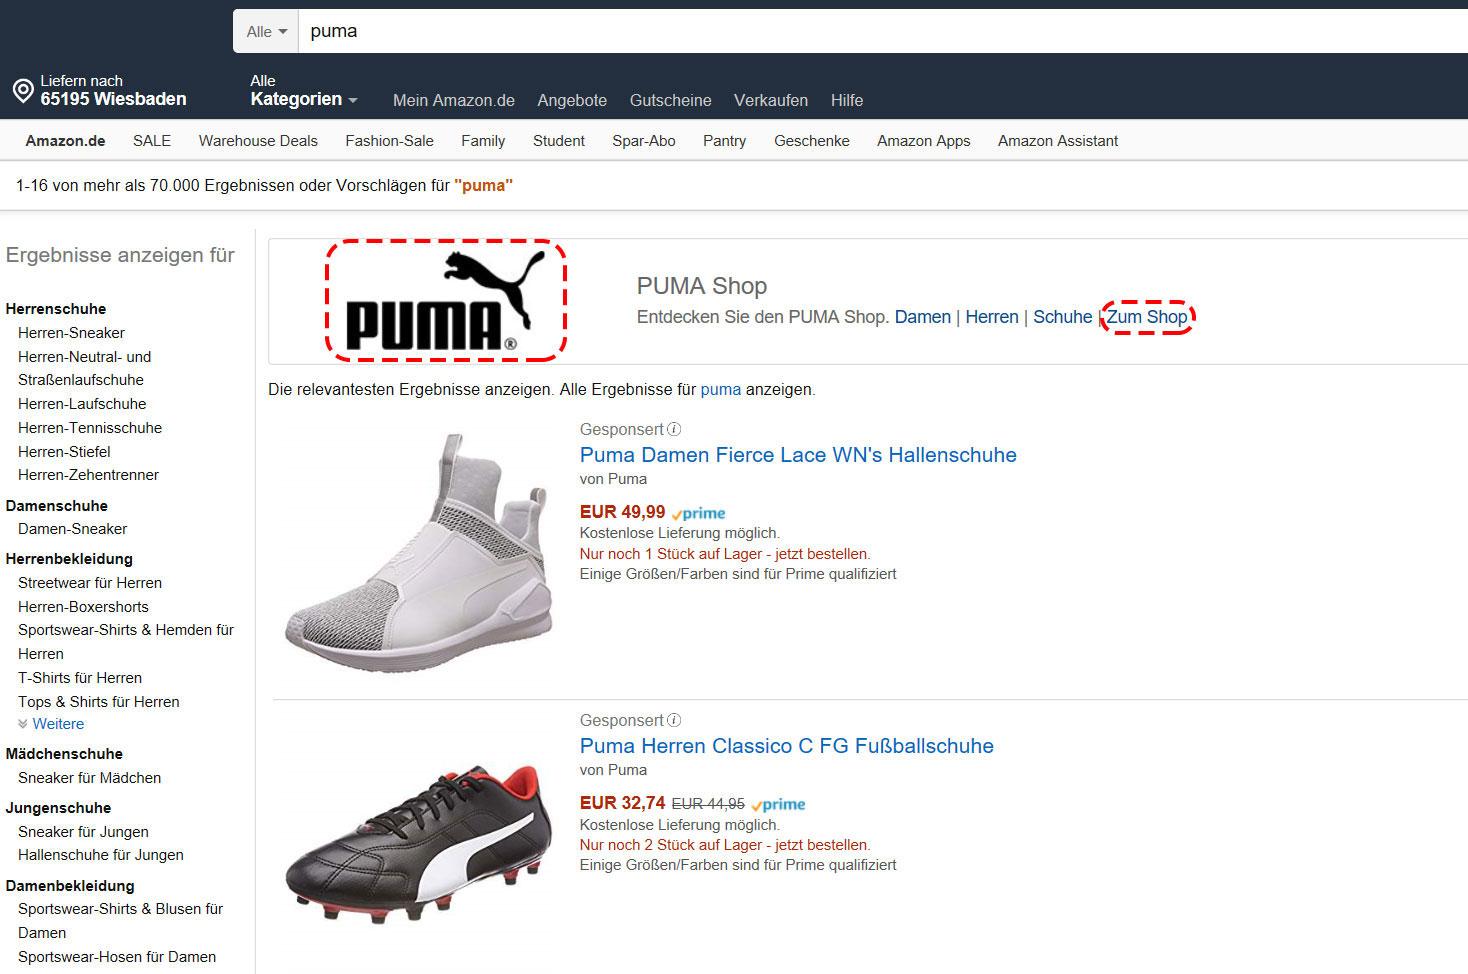 amazon-brandstore-sponsored-brands